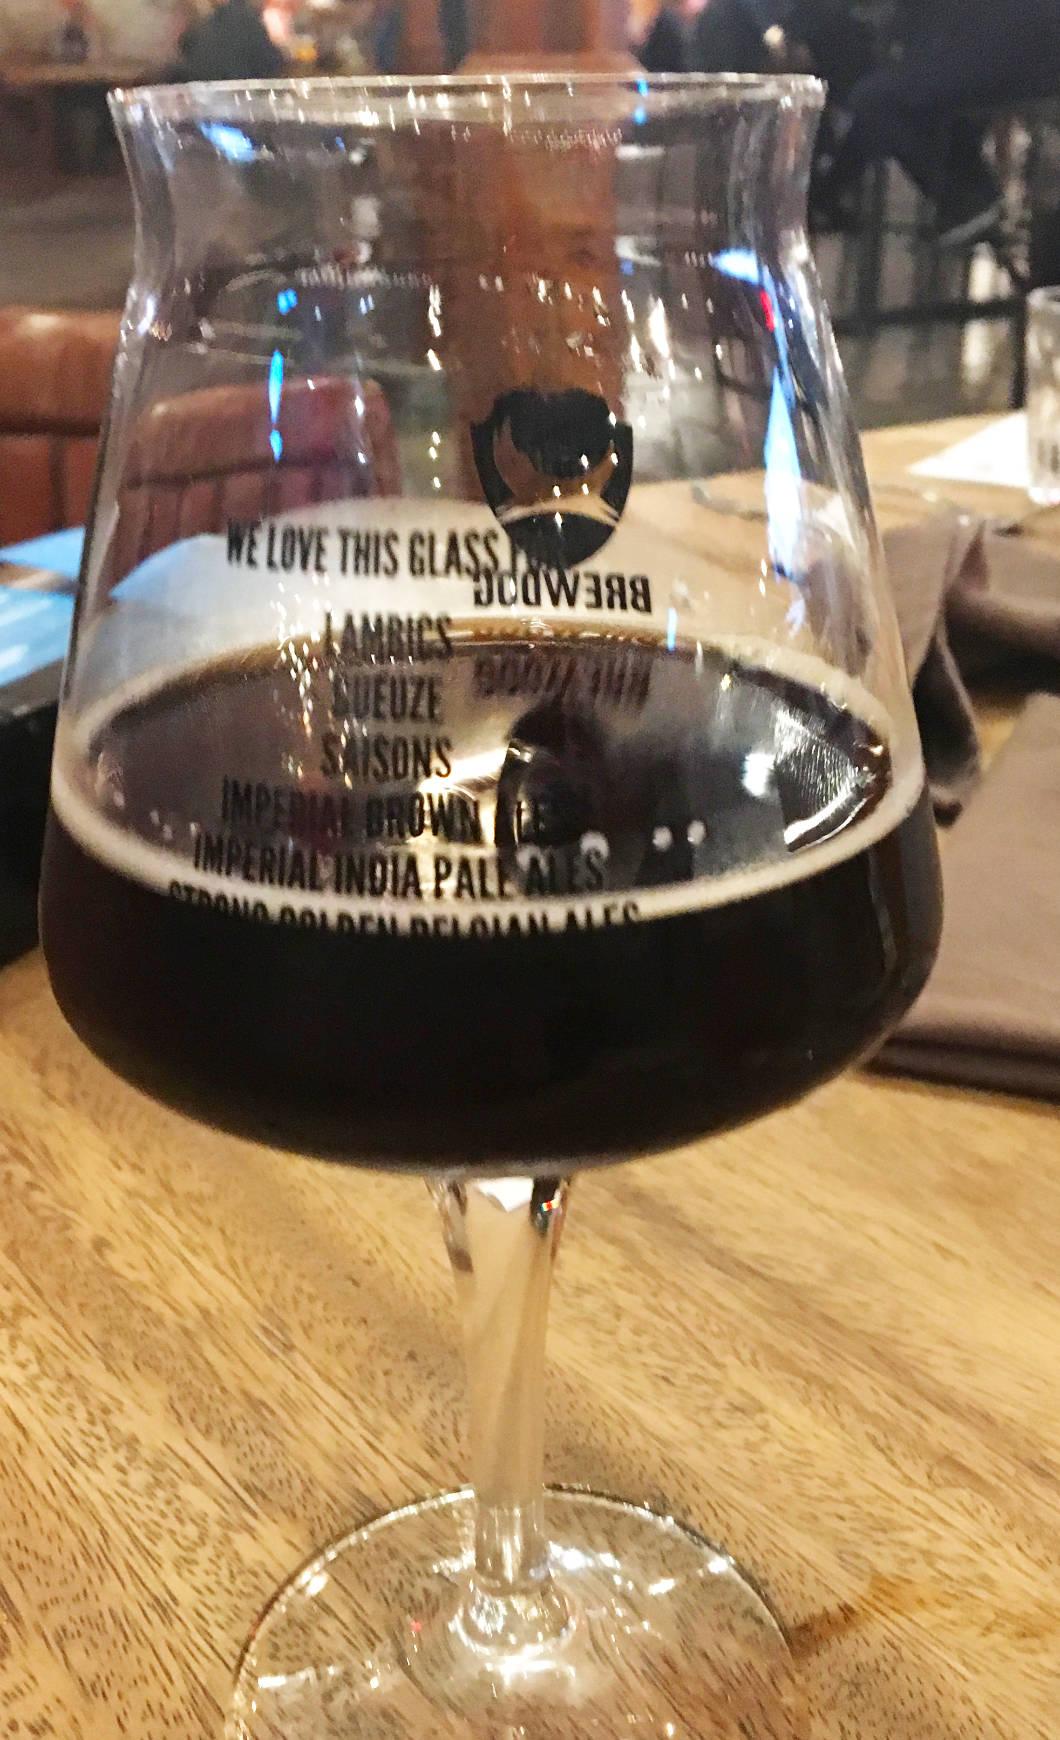 Cambridge Big drop Brewing